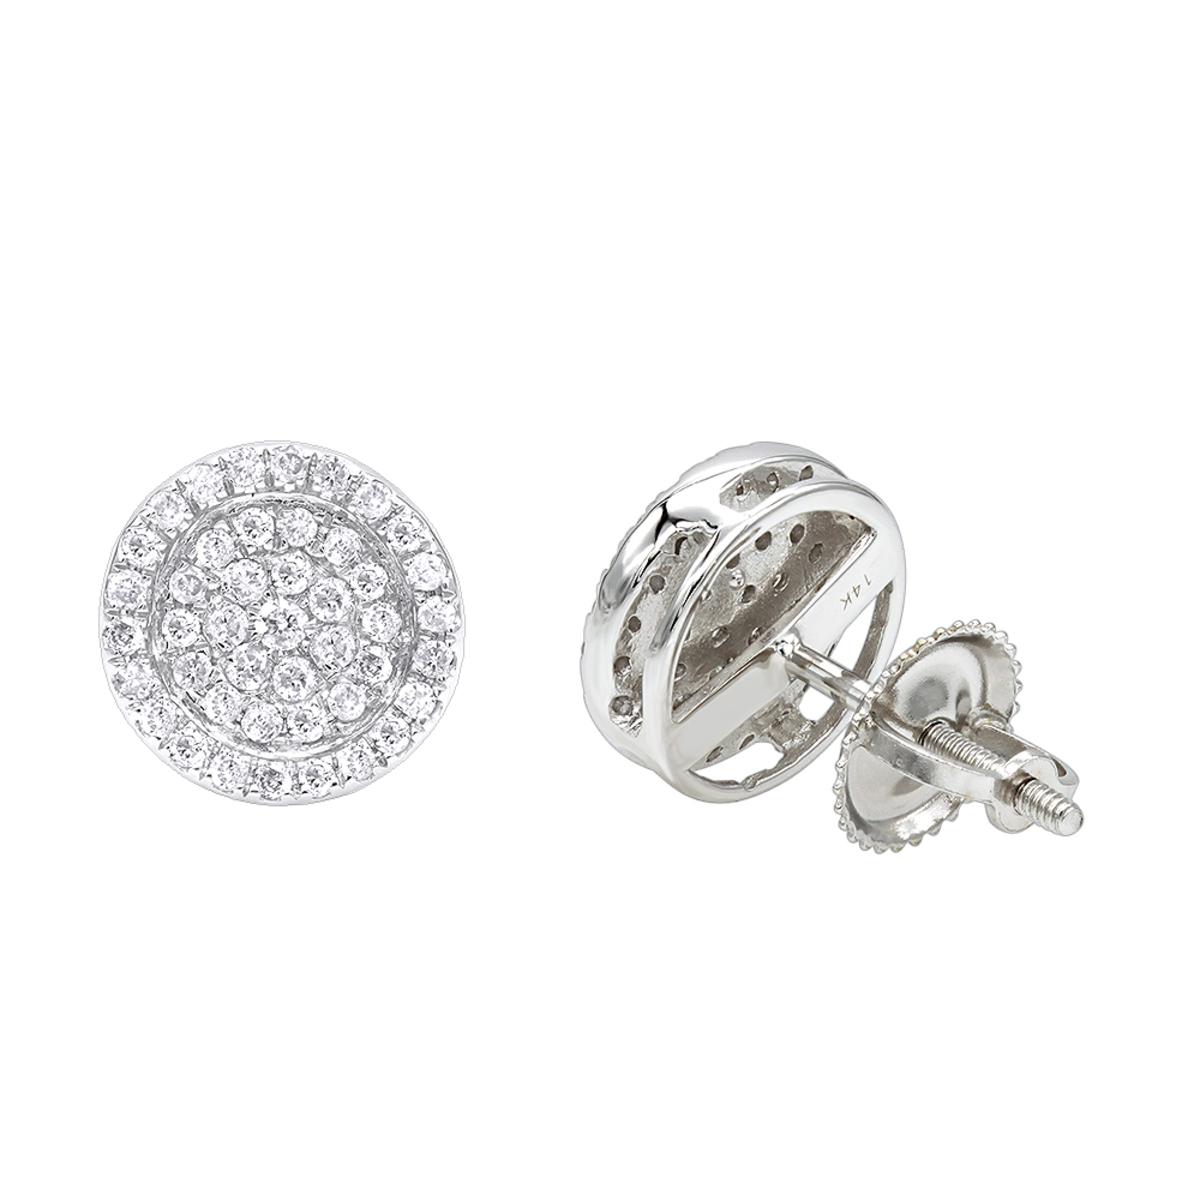 14K Gold Pave Round Diamond Stud Earrings 0.35ct by Luxurman